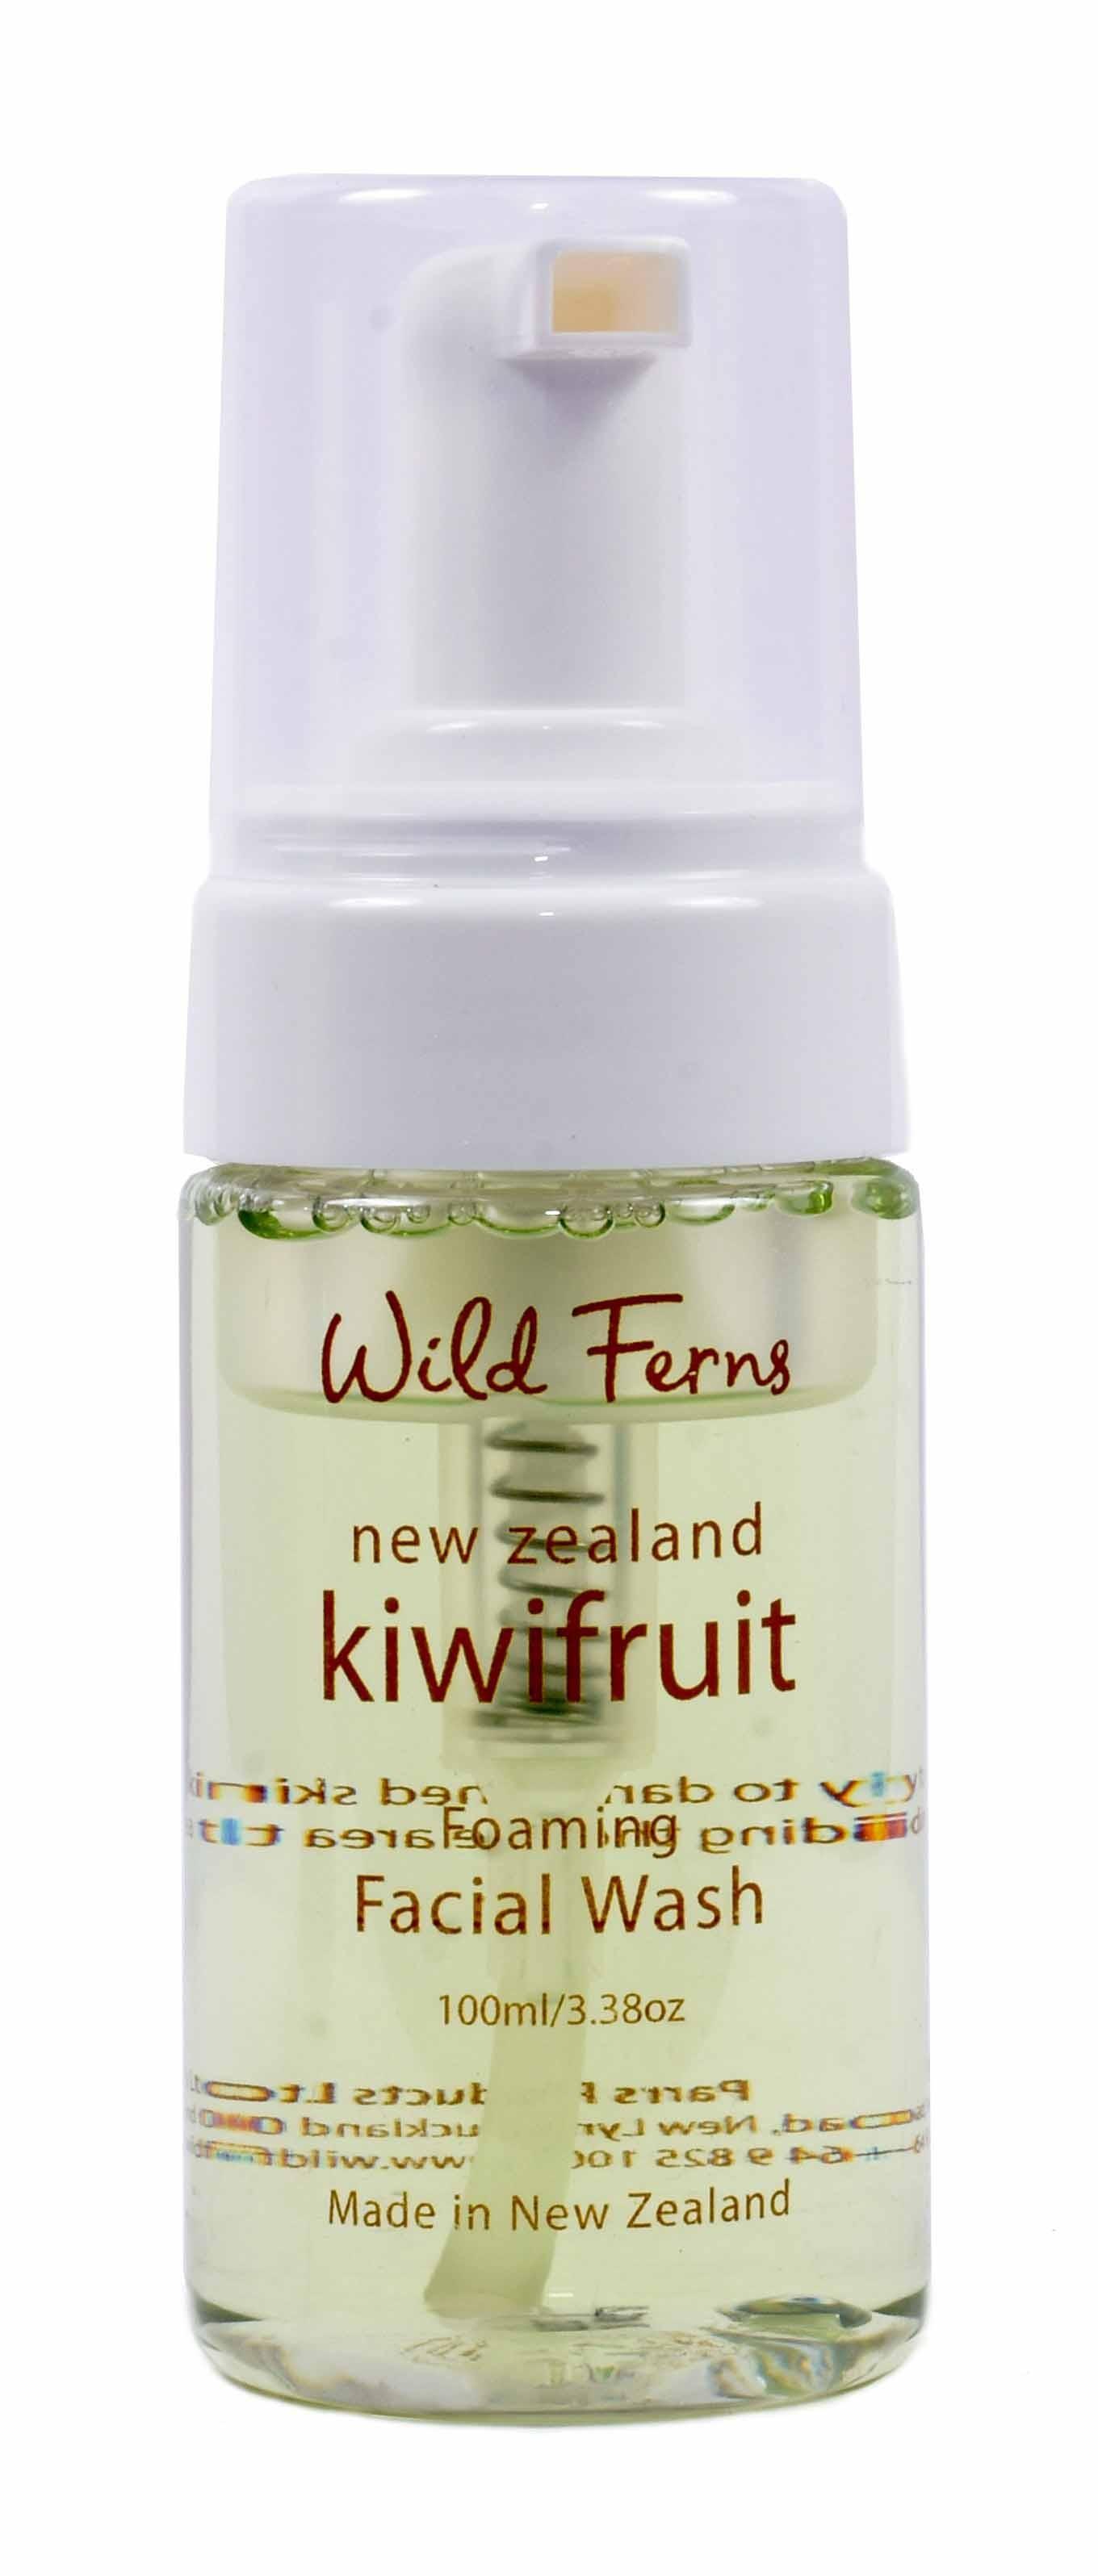 WILD FERNS KIWIFRUIT FOAMING FACIAL WASH 100 ML